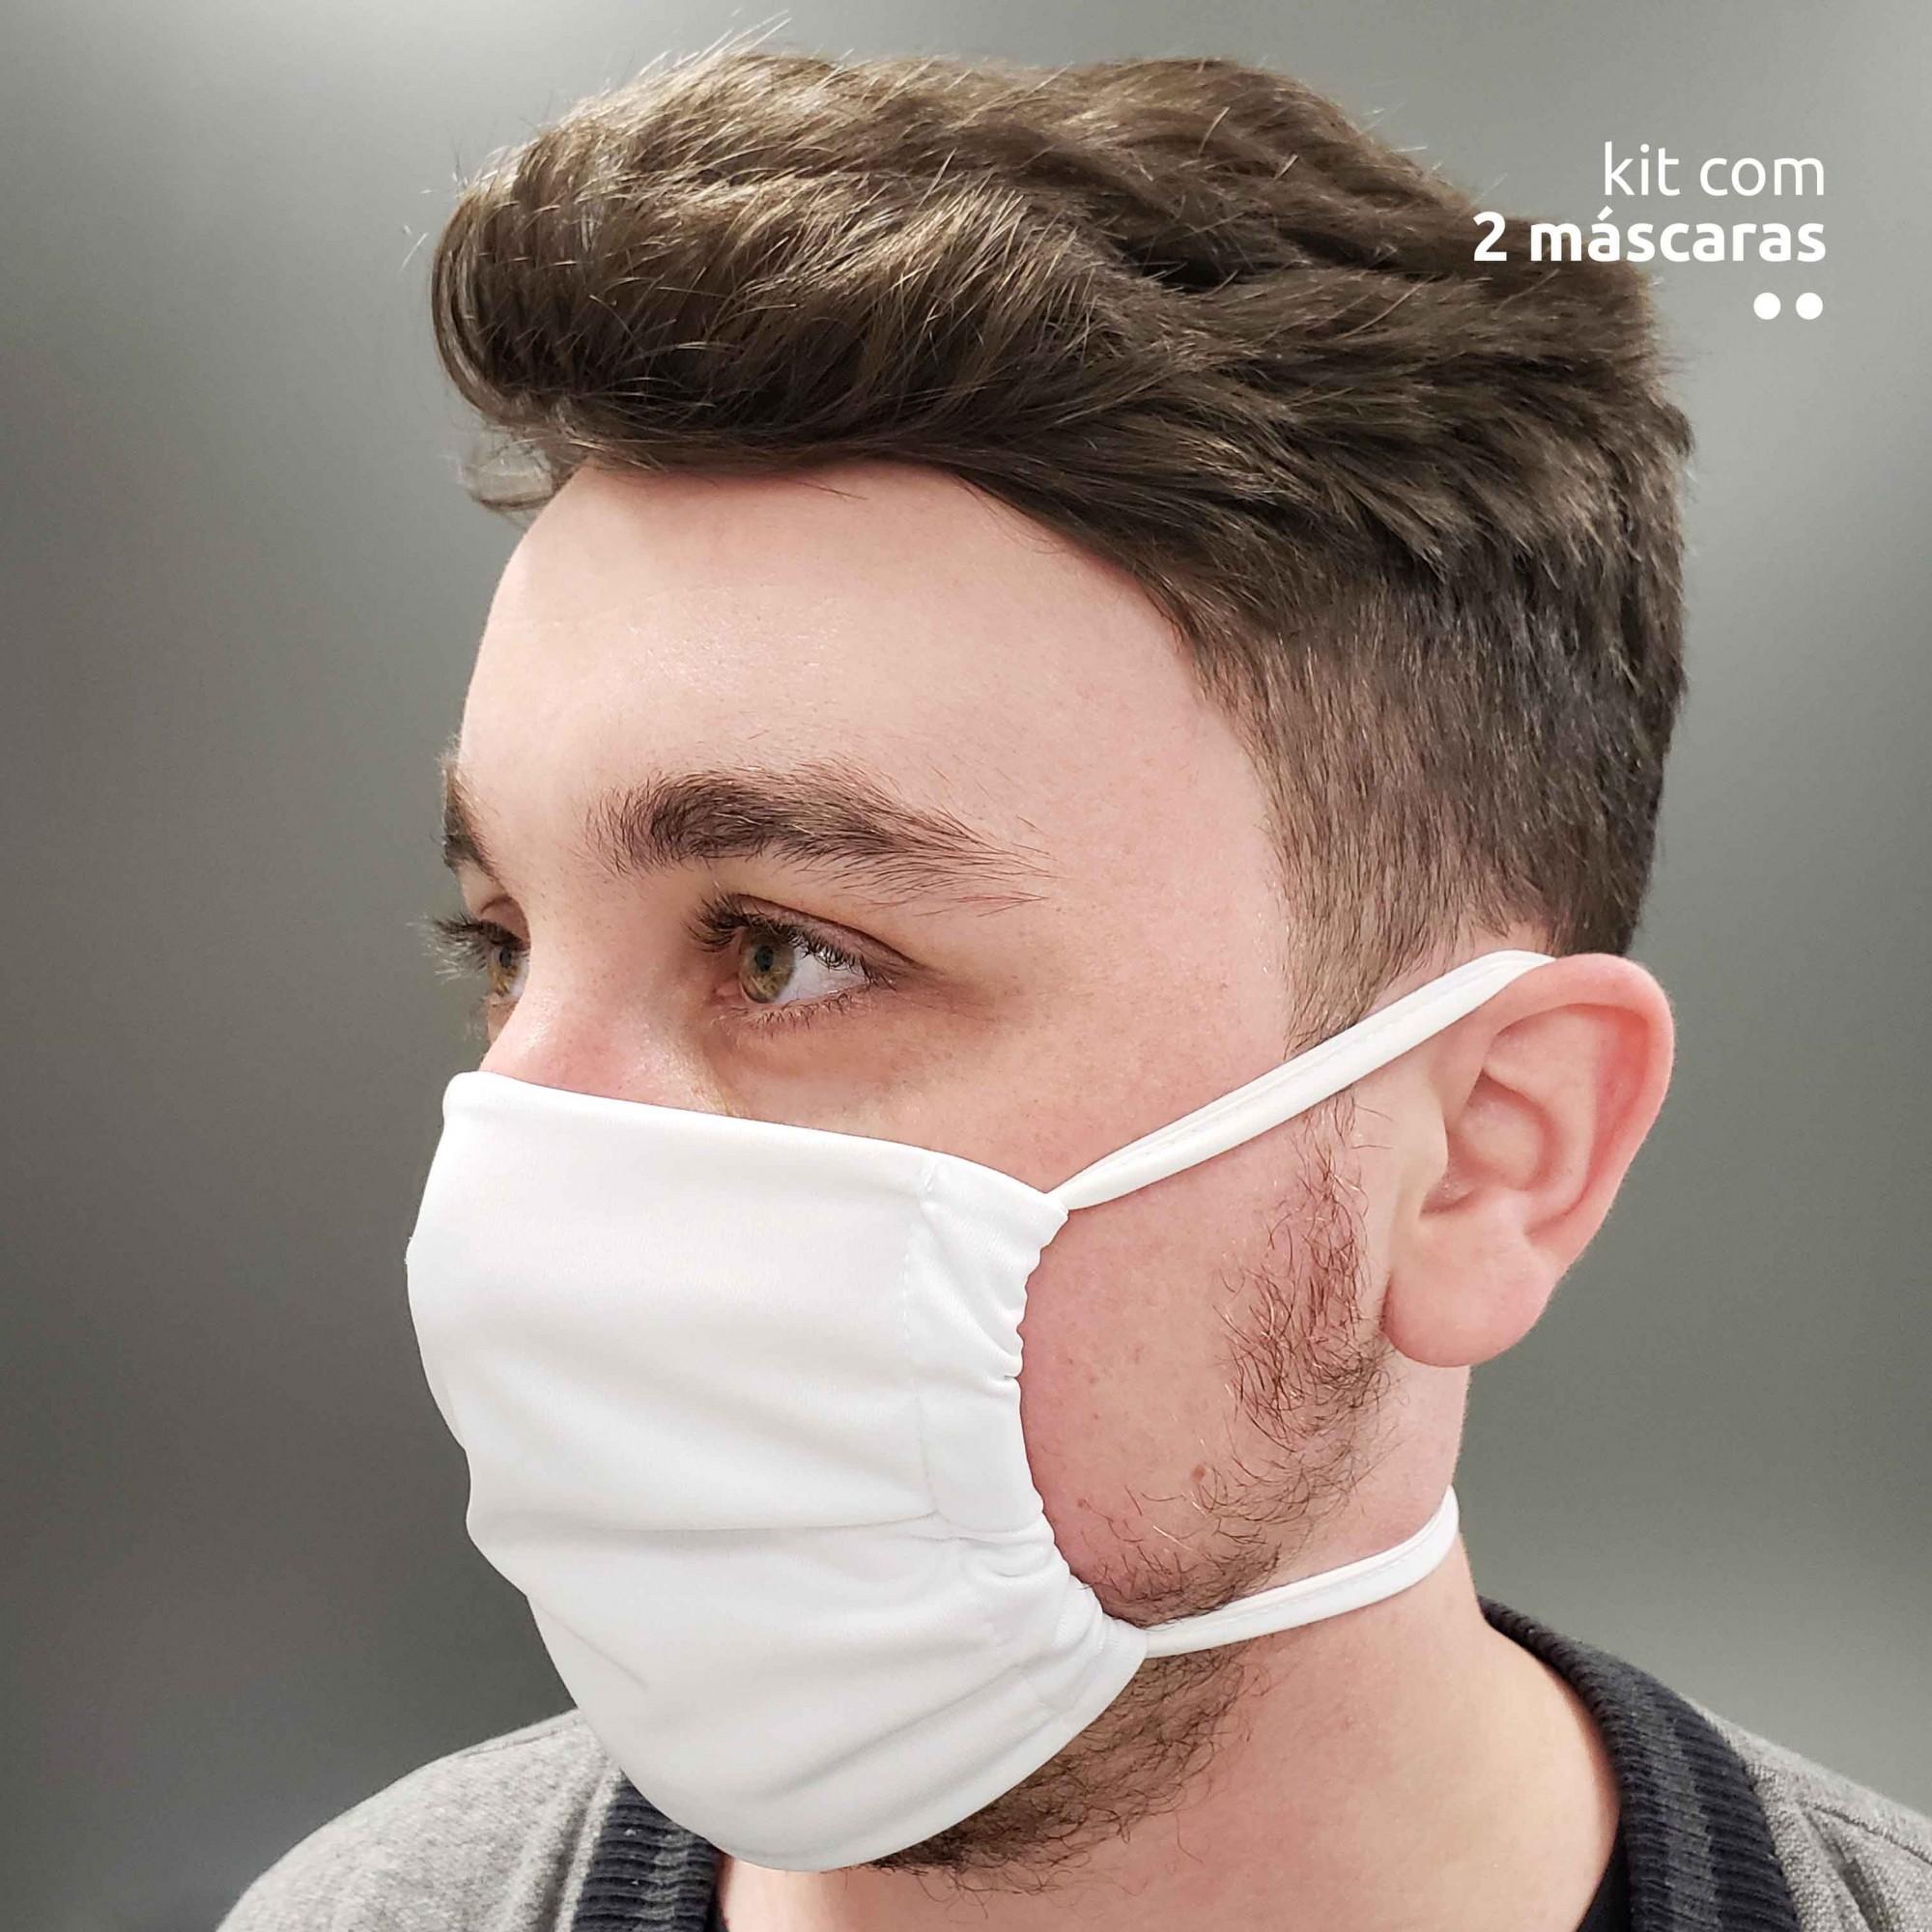 Kit com 2 máscaras antivirais - Branca